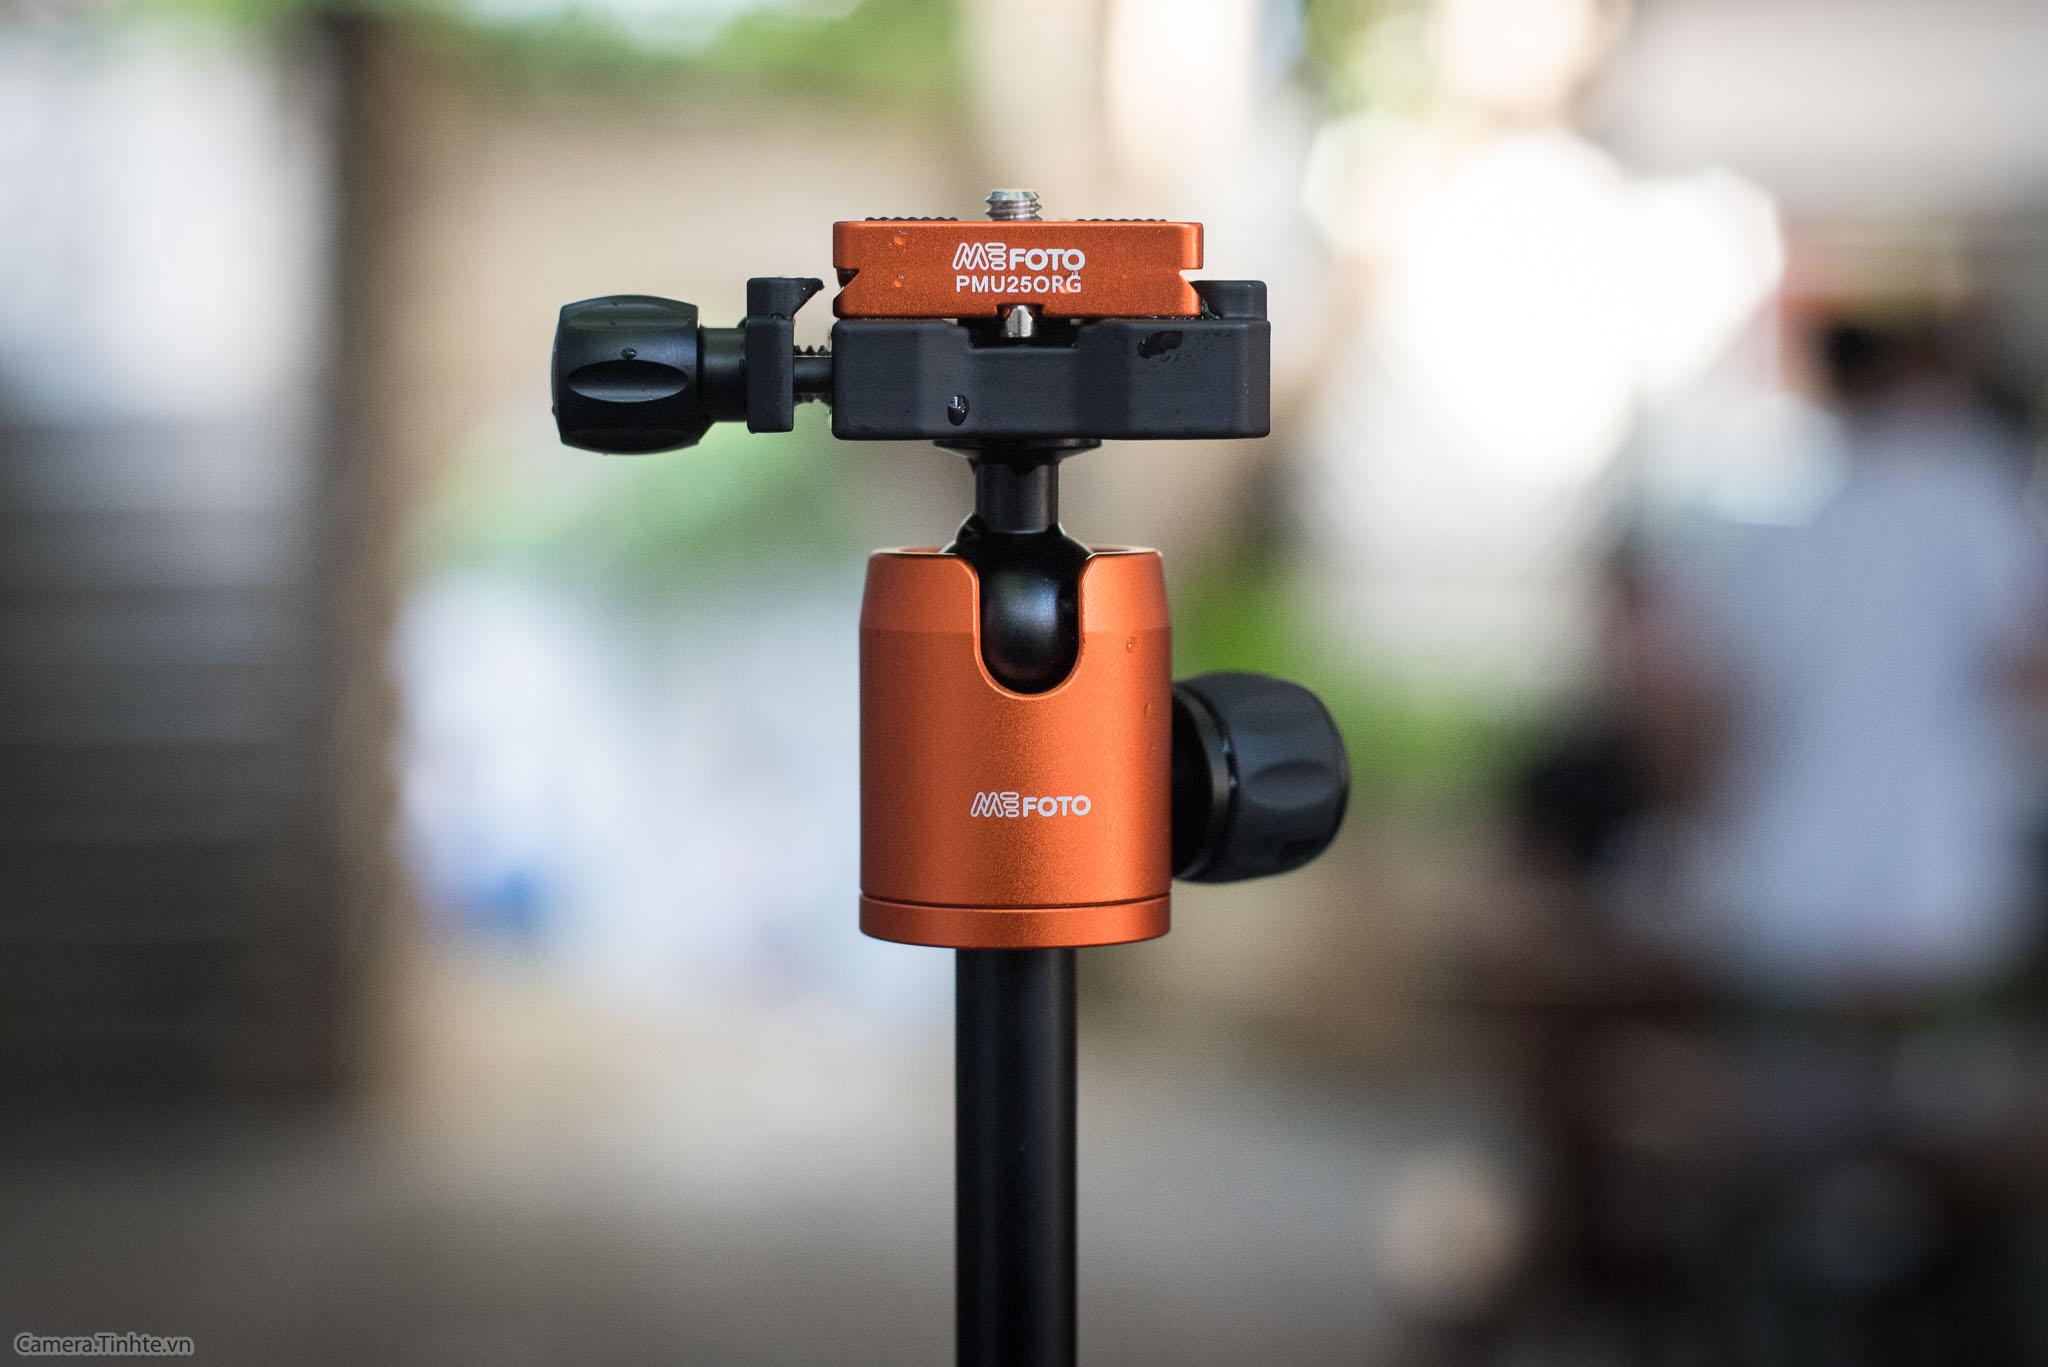 Tren tay tripod Mefoto Backpacker AIR - Camera.tinhte.vn-11.jpg